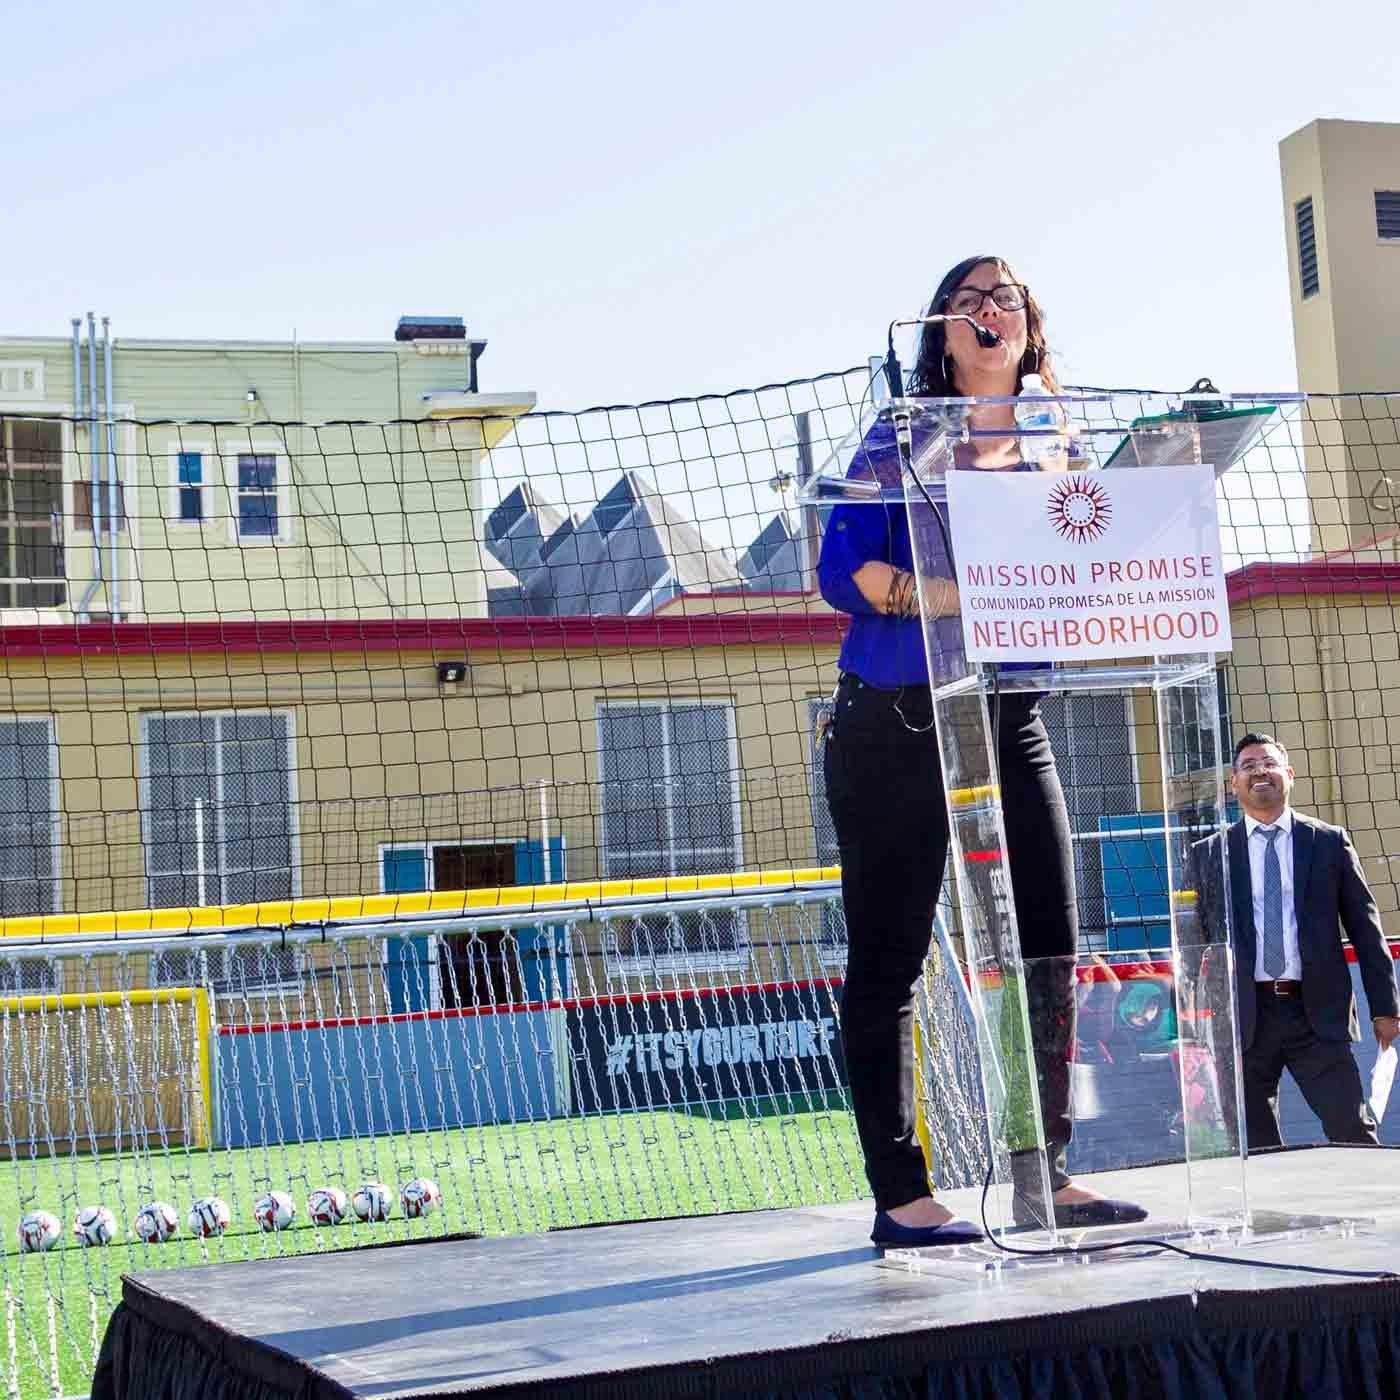 Claudia DeLarios Moran speaking a Buena Vista Horace Mann Soccer Park San Francisco